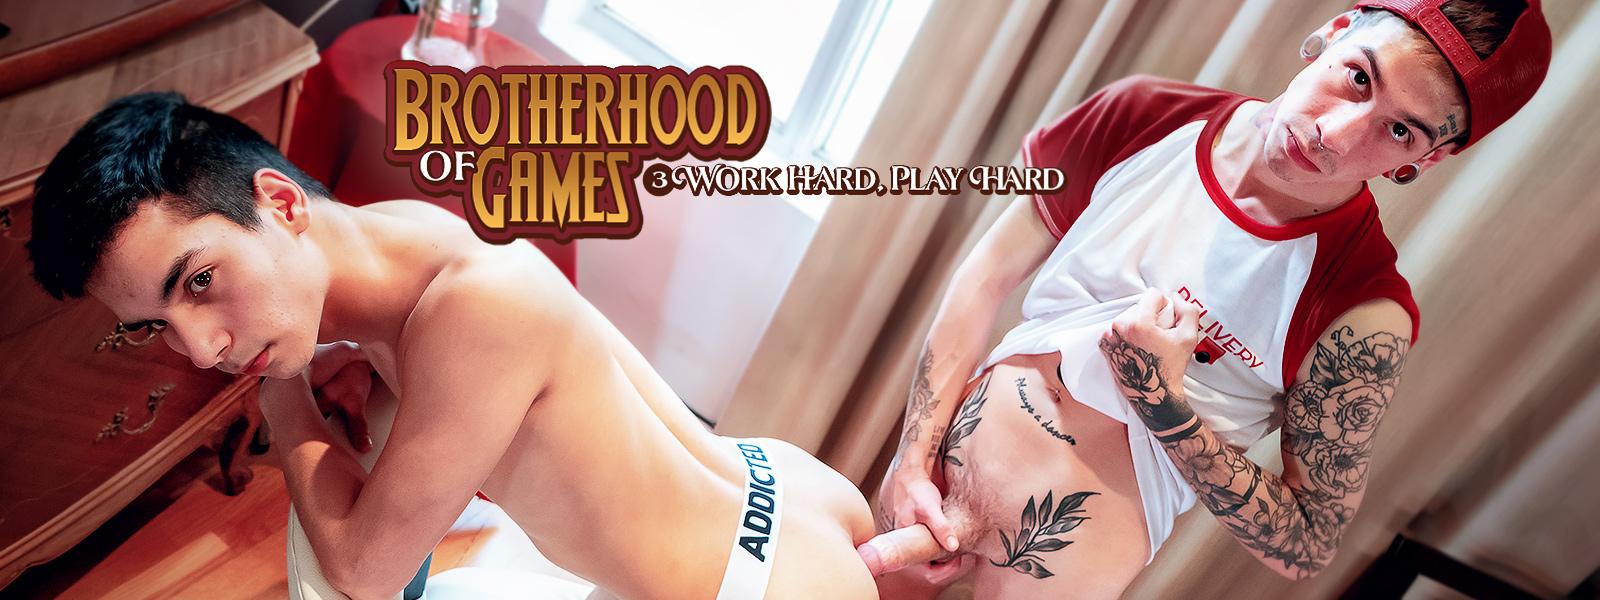 Brotherhood of Games   Ch. 3 Work Hard, Play Hard